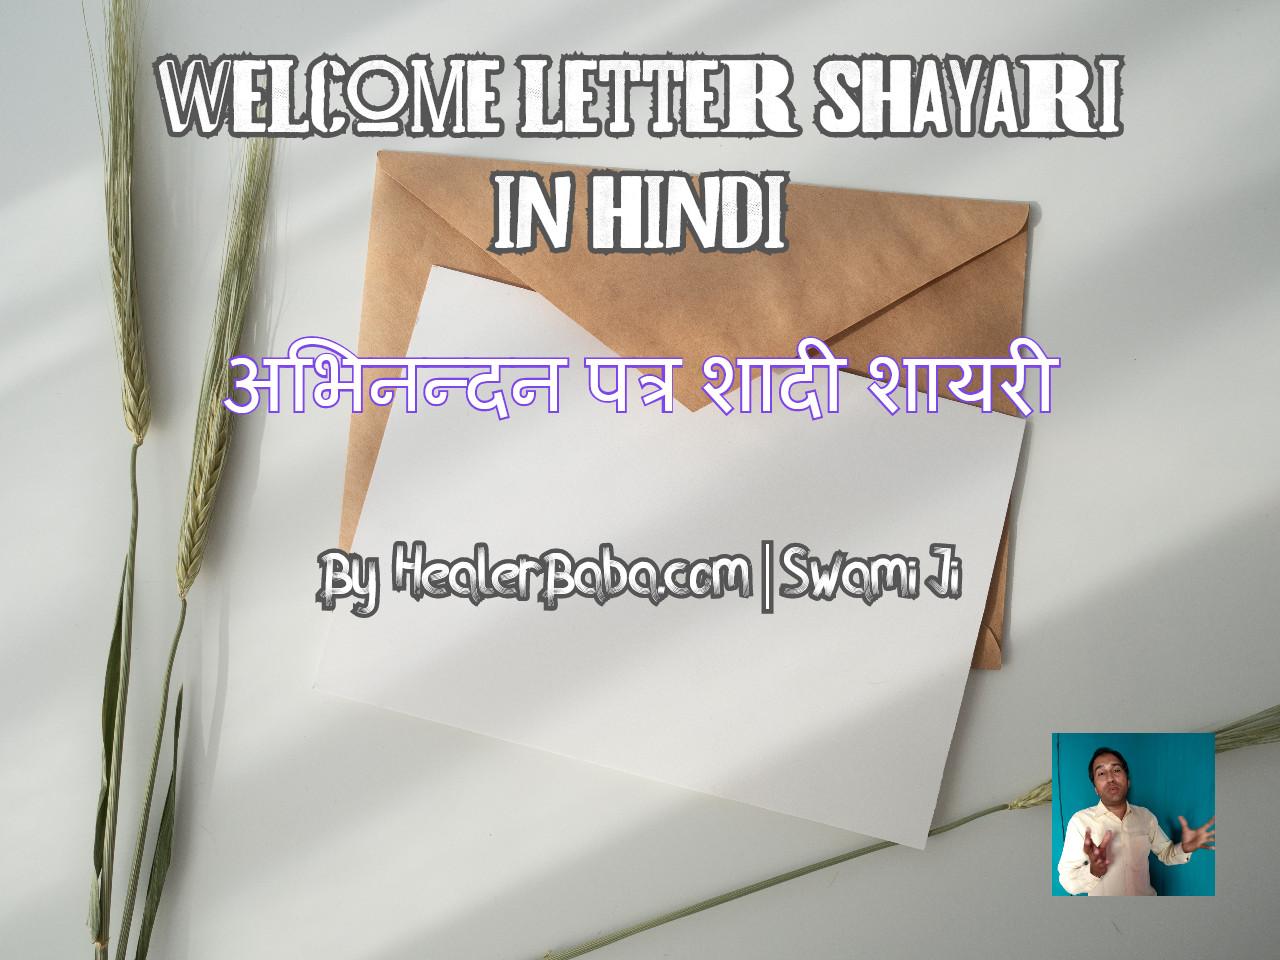 Welcome Letter Shayari in Hindi | अभिनन्दन पत्र शादी शायरी